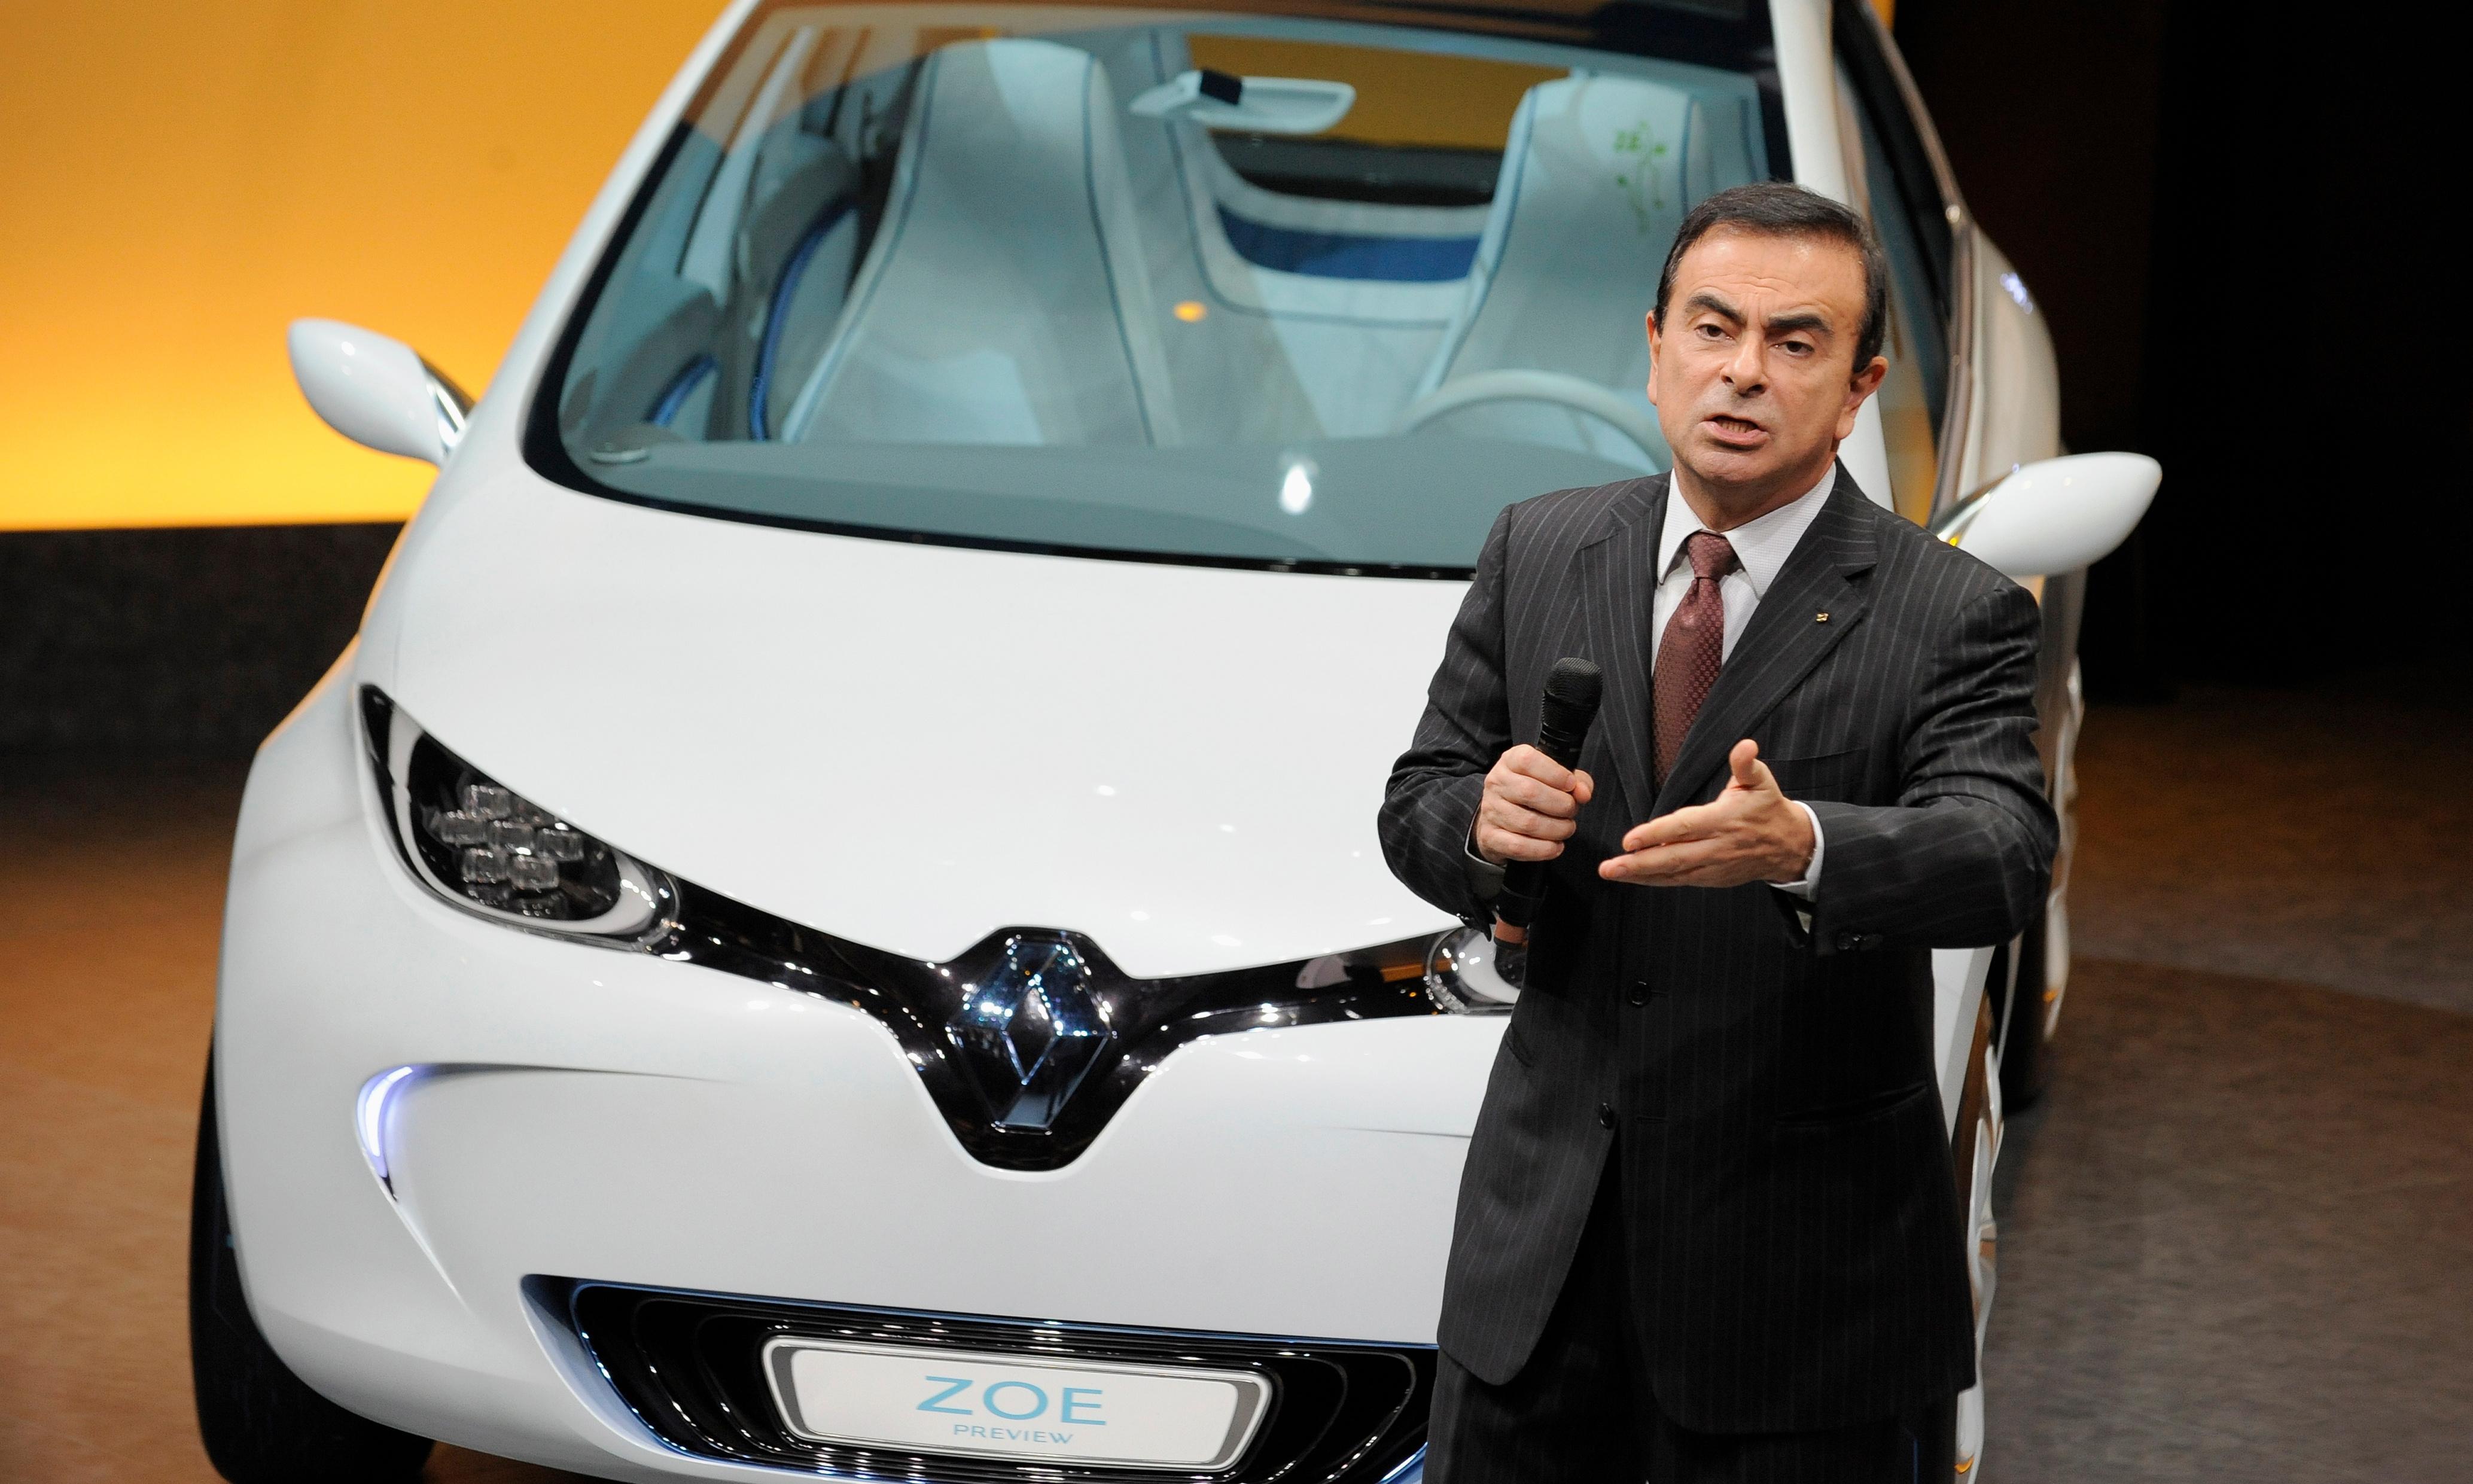 Renault refuses to remove Carlos Ghosn despite shock arrest